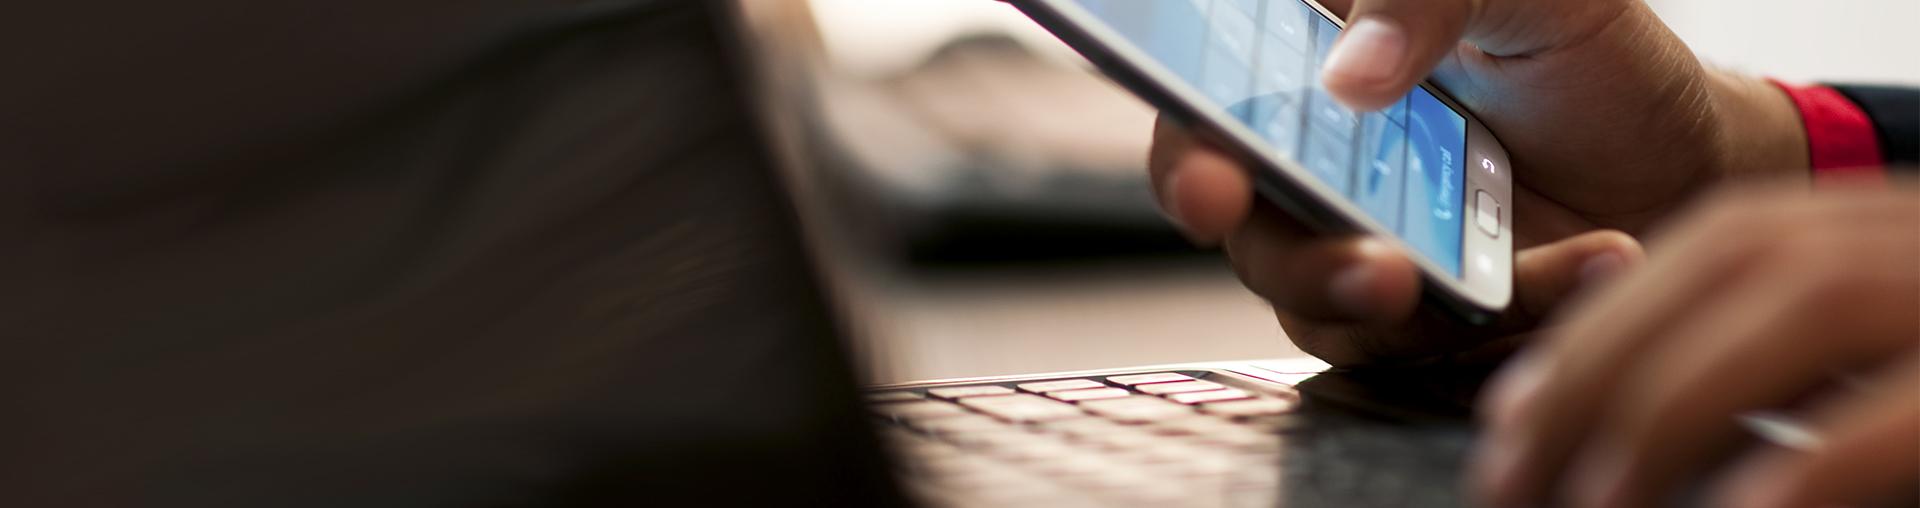 اپراتور مجازی تلفن همراه (MVNO)